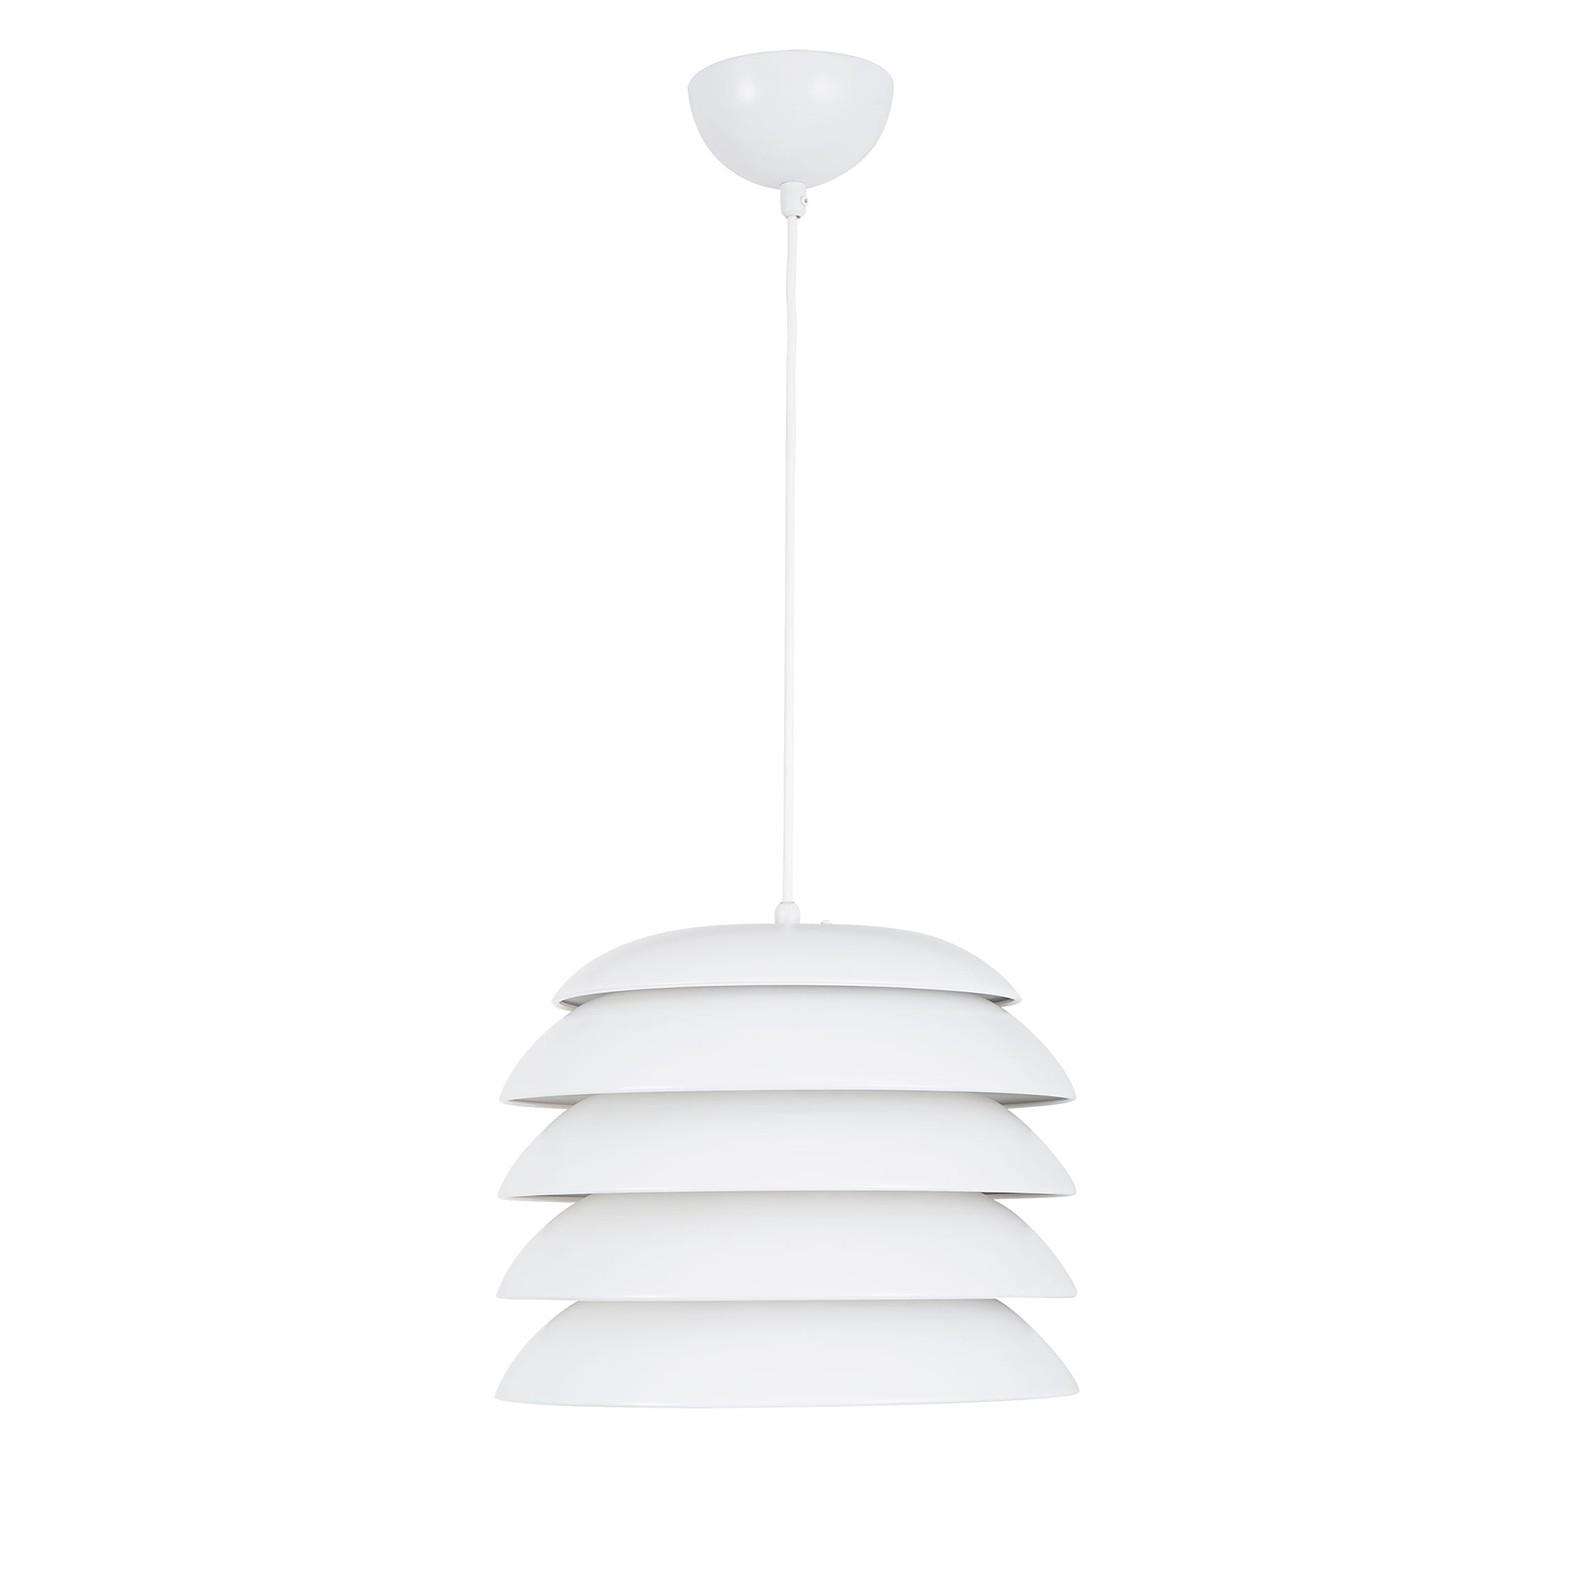 EEK A++, Suspension Orbis - Aluminium - 1 ampoule, Loistaa